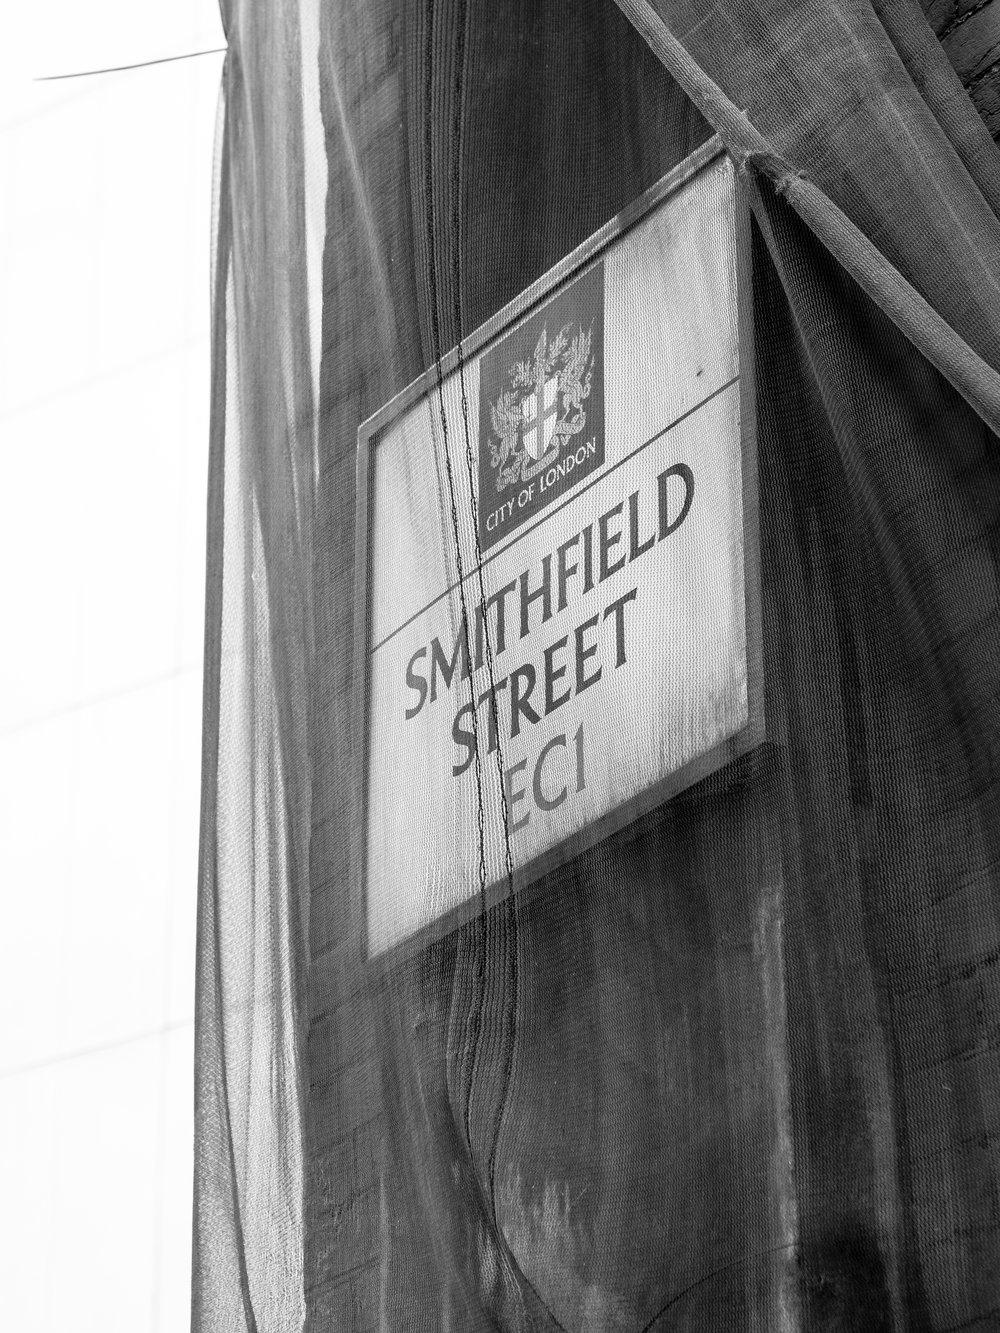 SMITHFIELD STREET